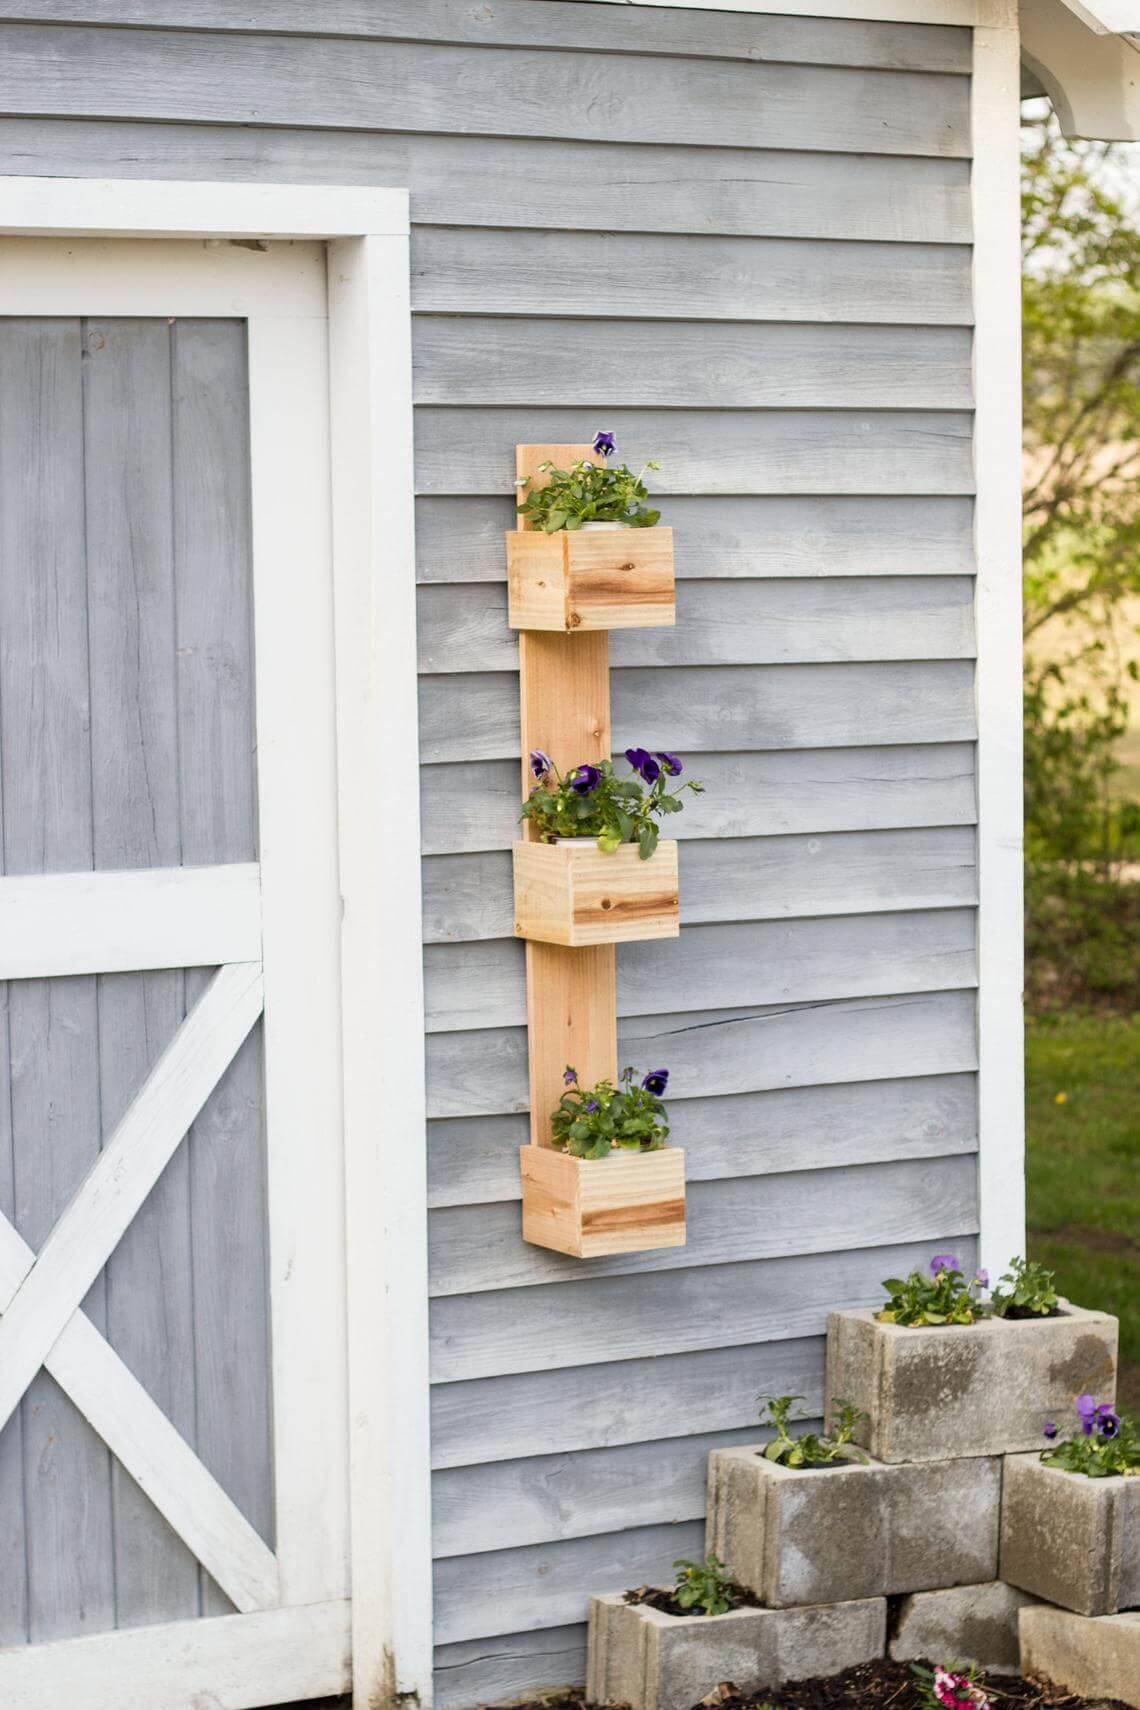 Rustic Tiered Cedar Box Hanging Planter